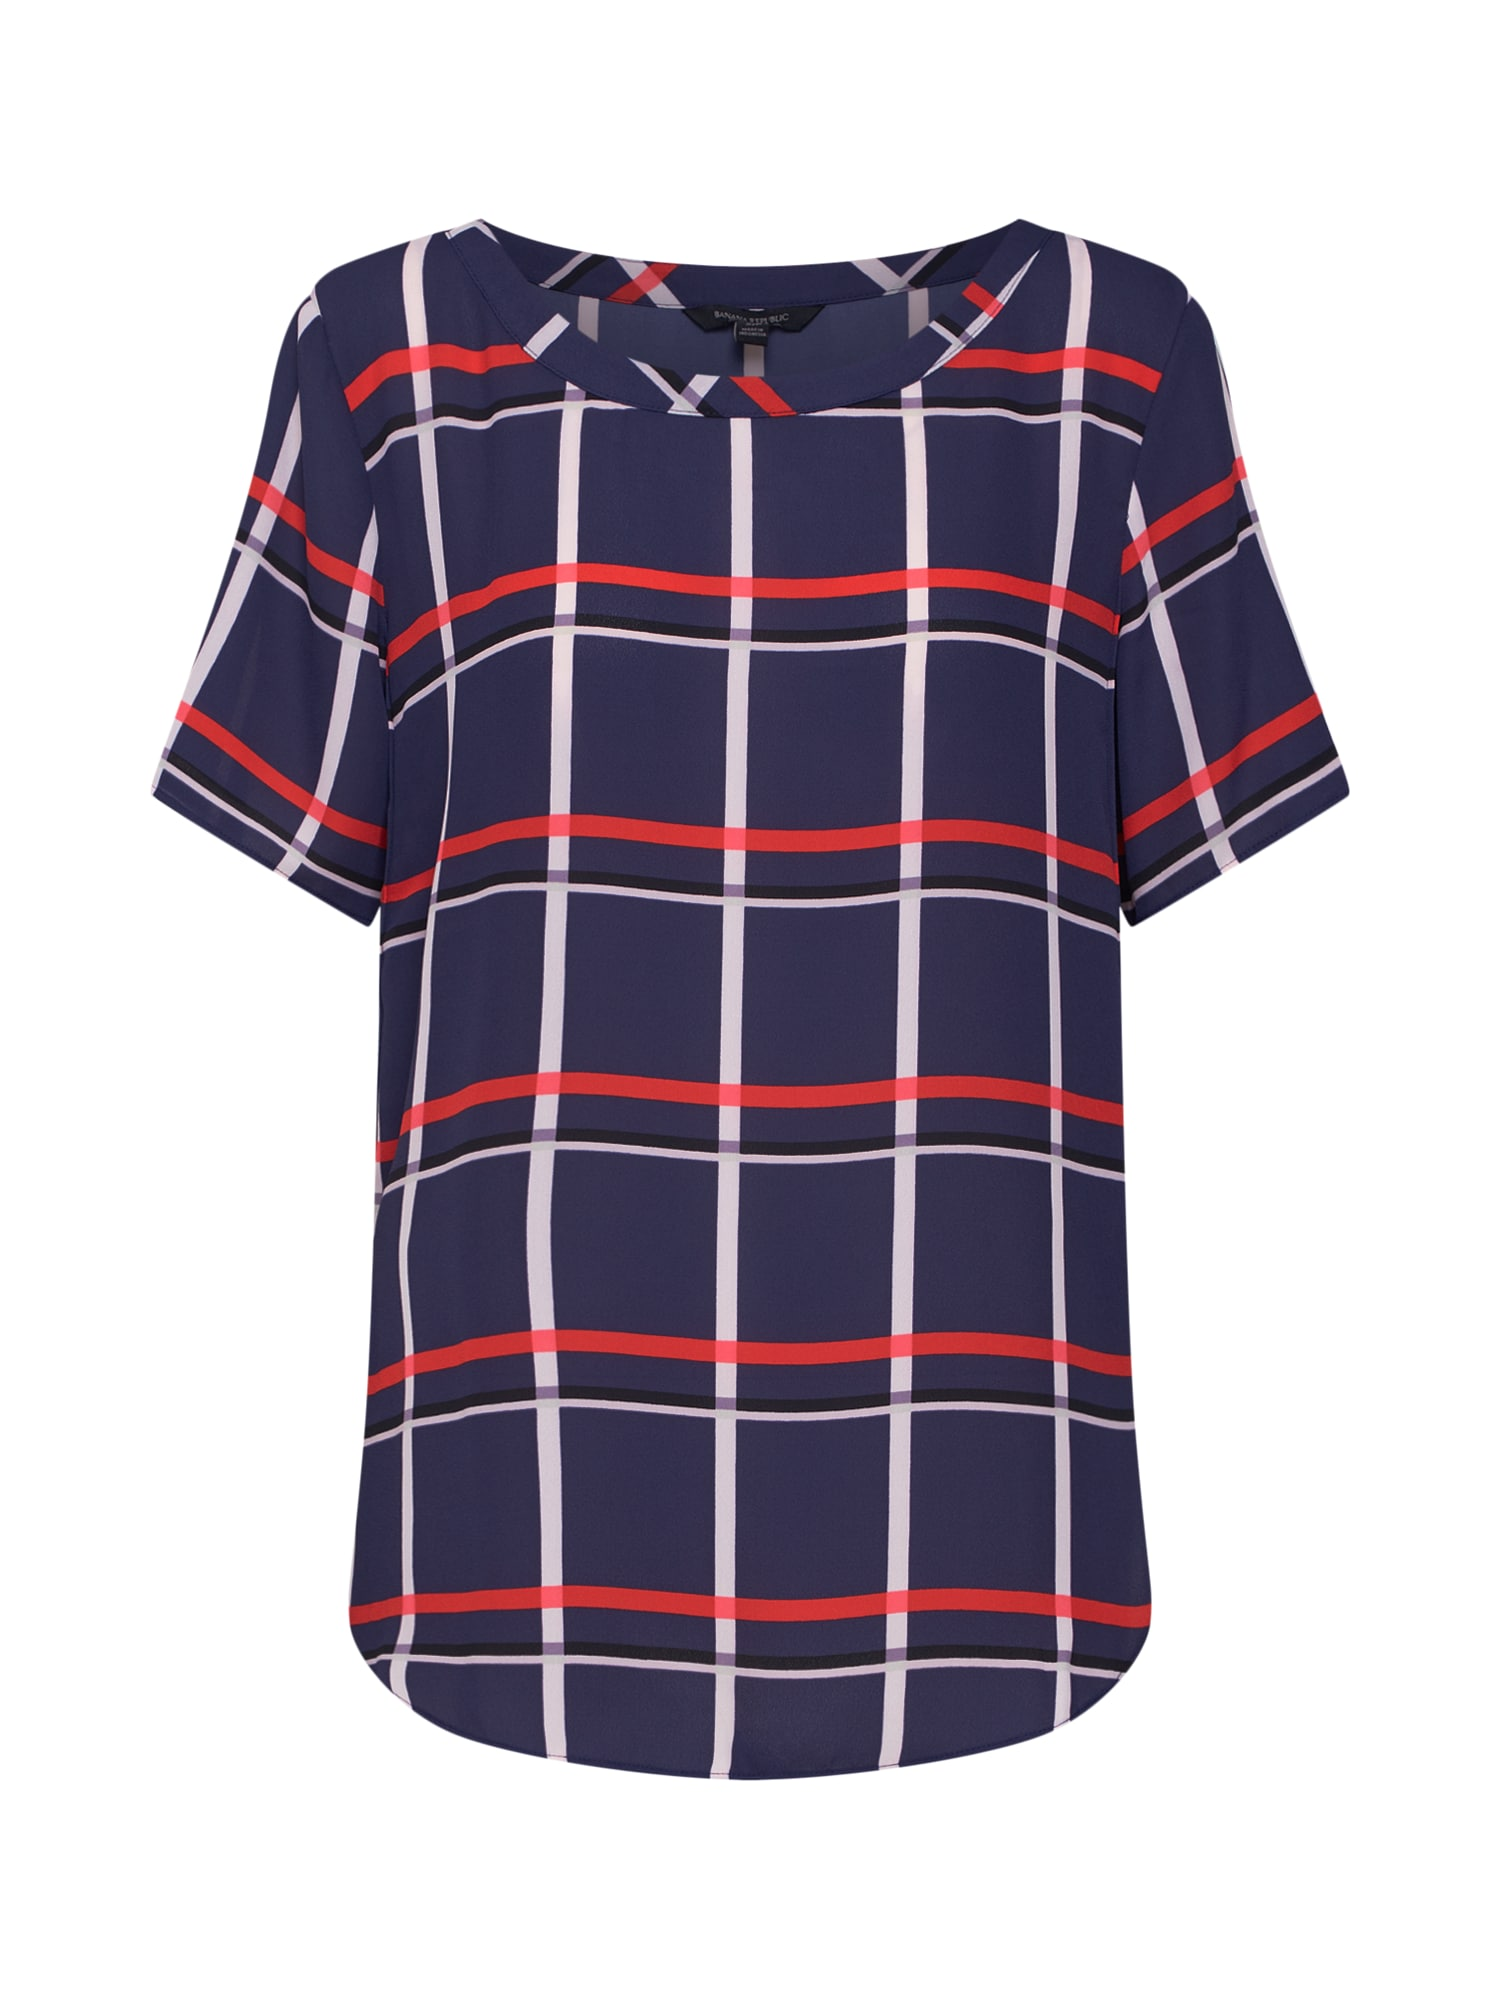 Tričko SS CREW PERFECT TEE AURORA COLORBLOCK námořnická modř světle červená bílá Banana Republic